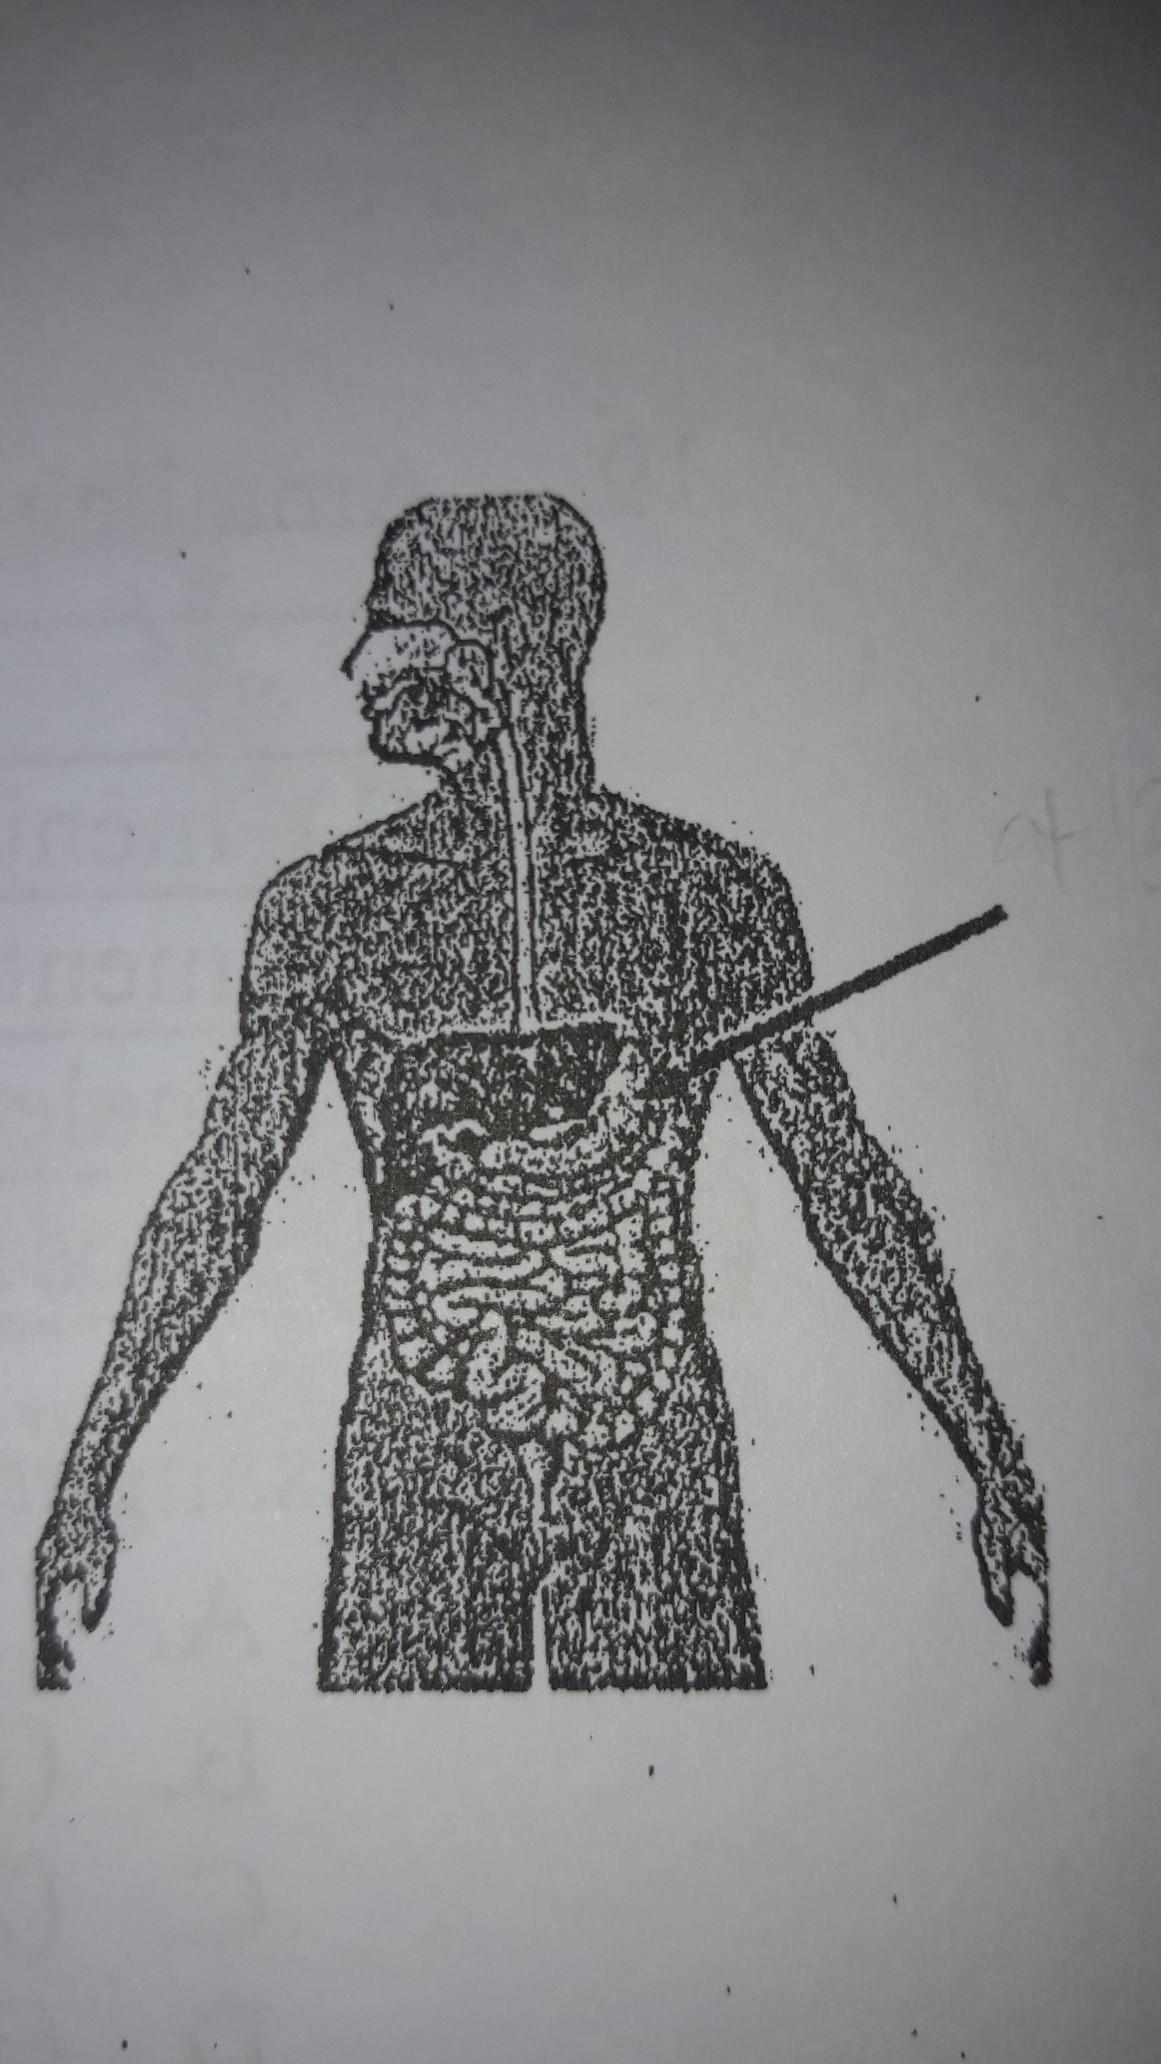 organ yang ditunjuk tanda panah menghasilkan enzim ...